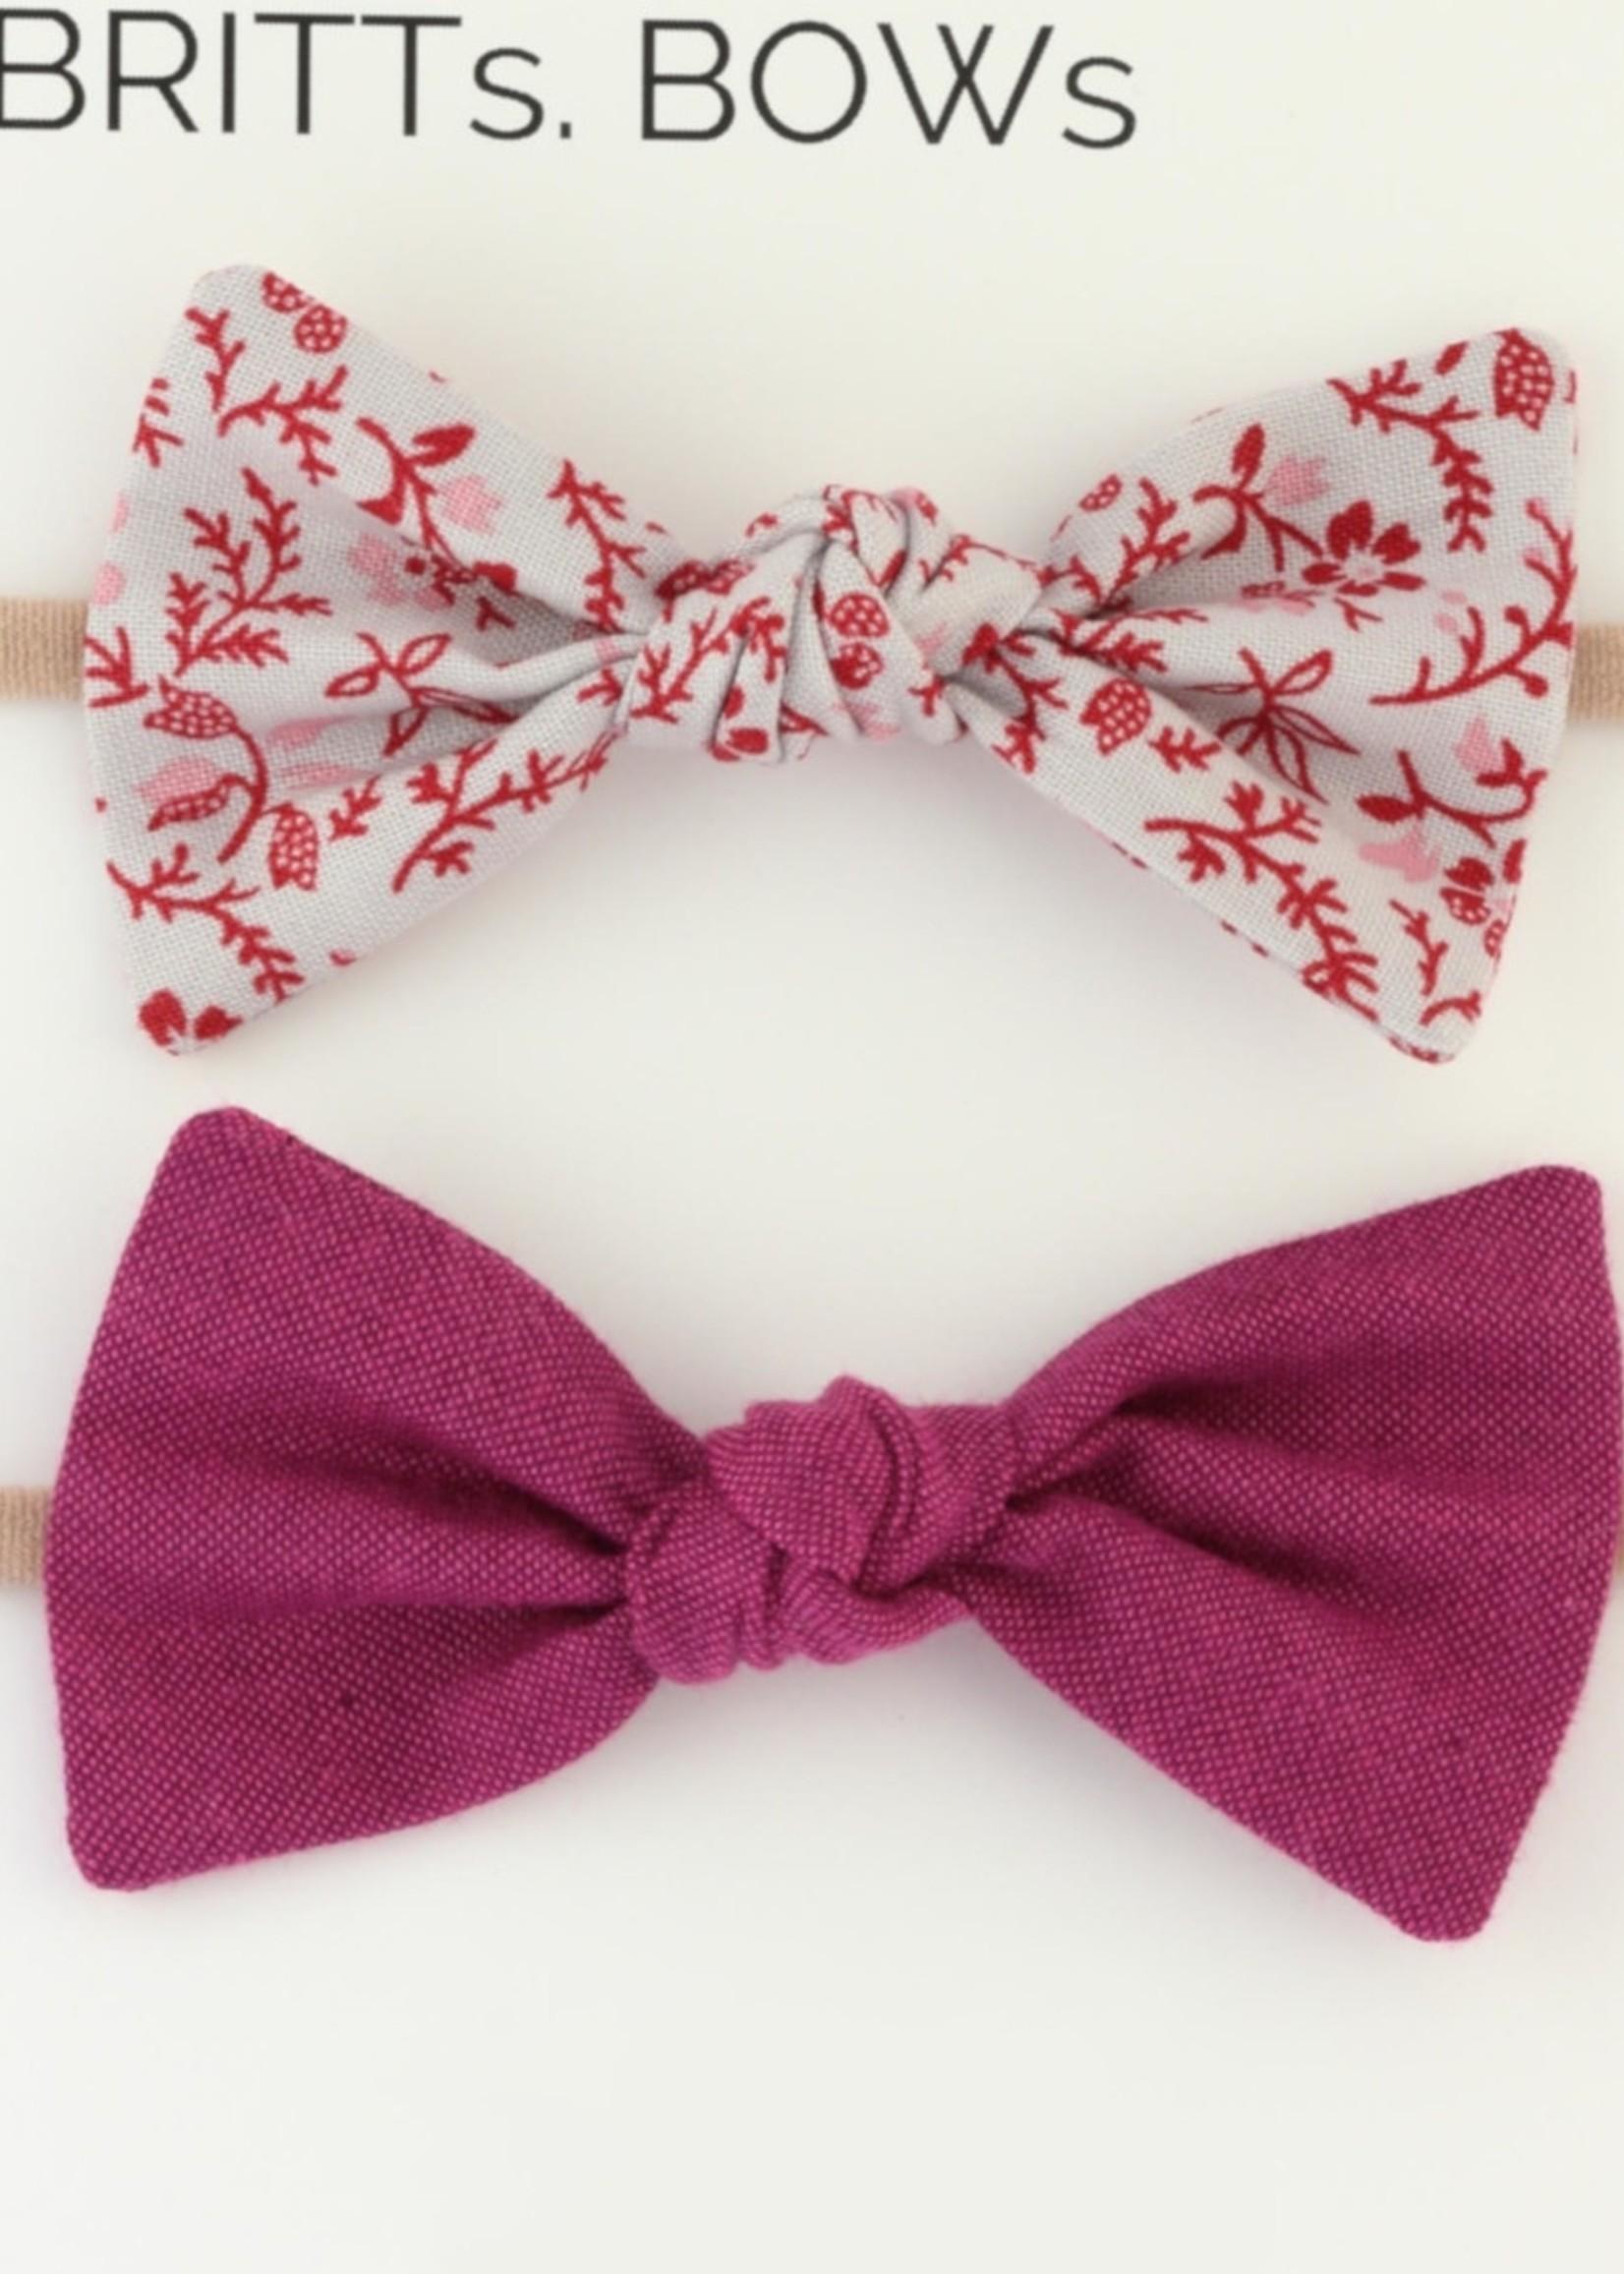 Britts bows Purple/Gray Floral Headband